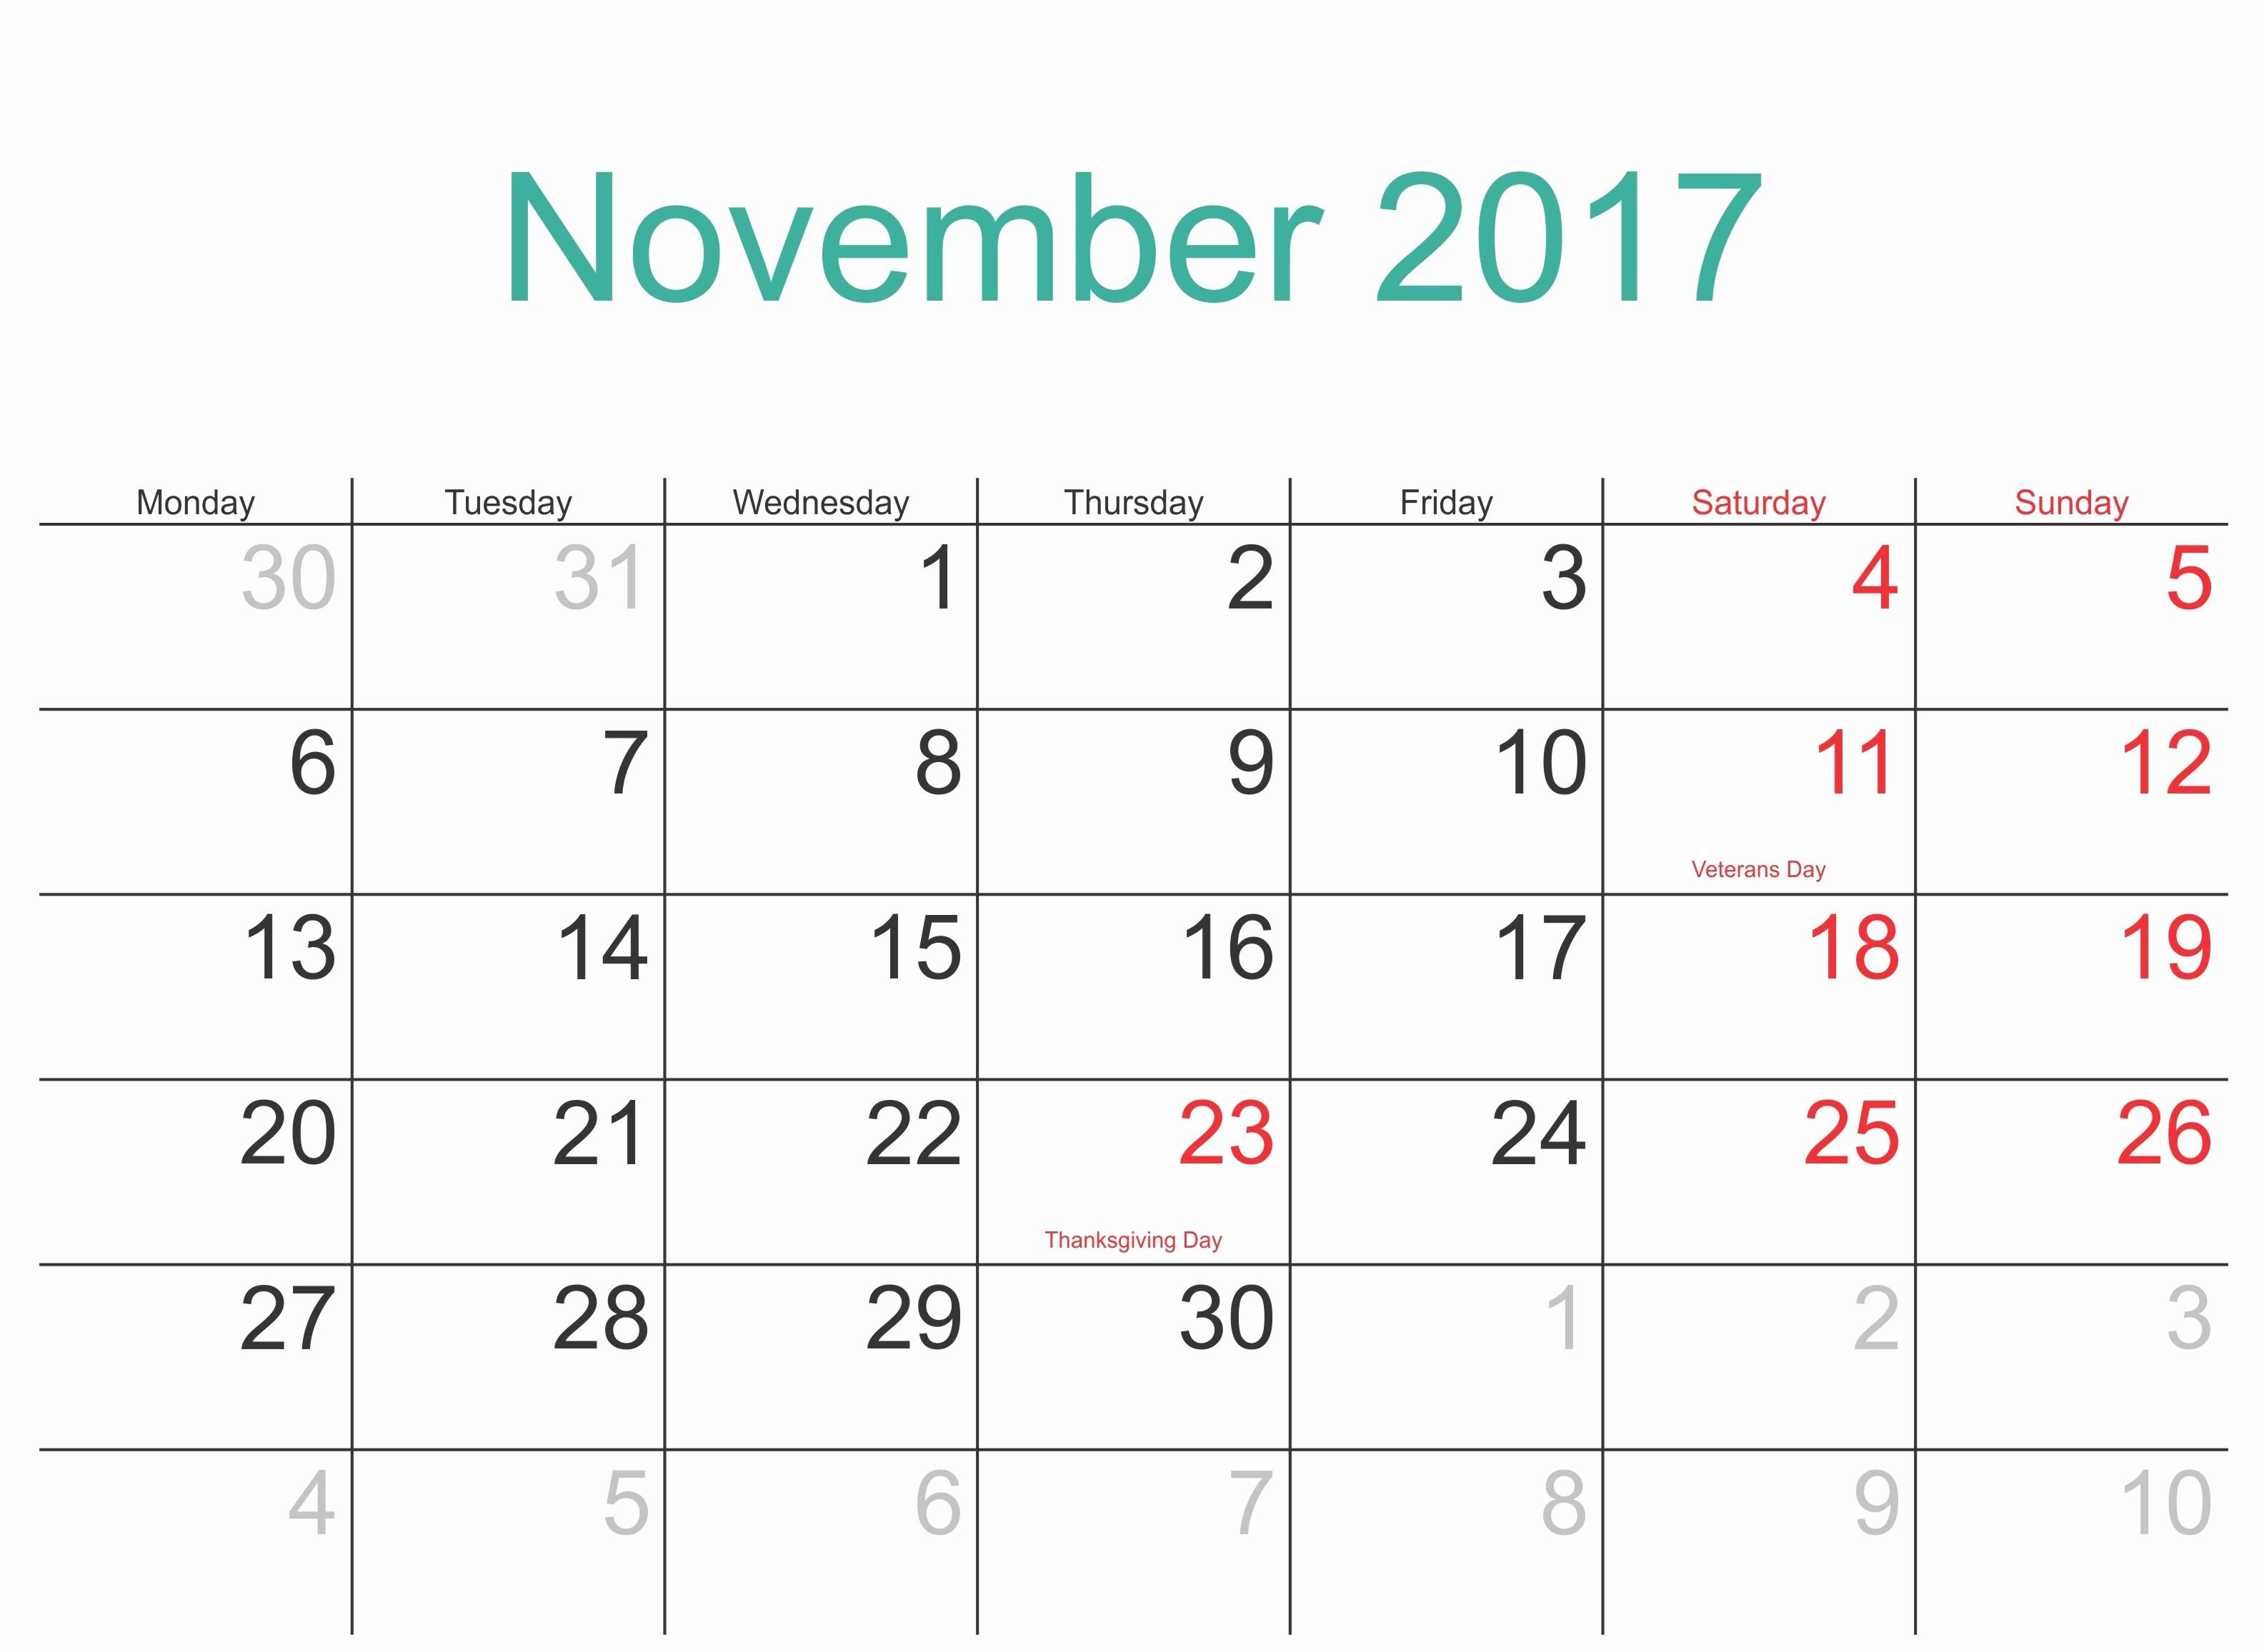 Free 2017 Printable Calendar Word Fresh November 2017 Printable Calendar Template Holidays Excel